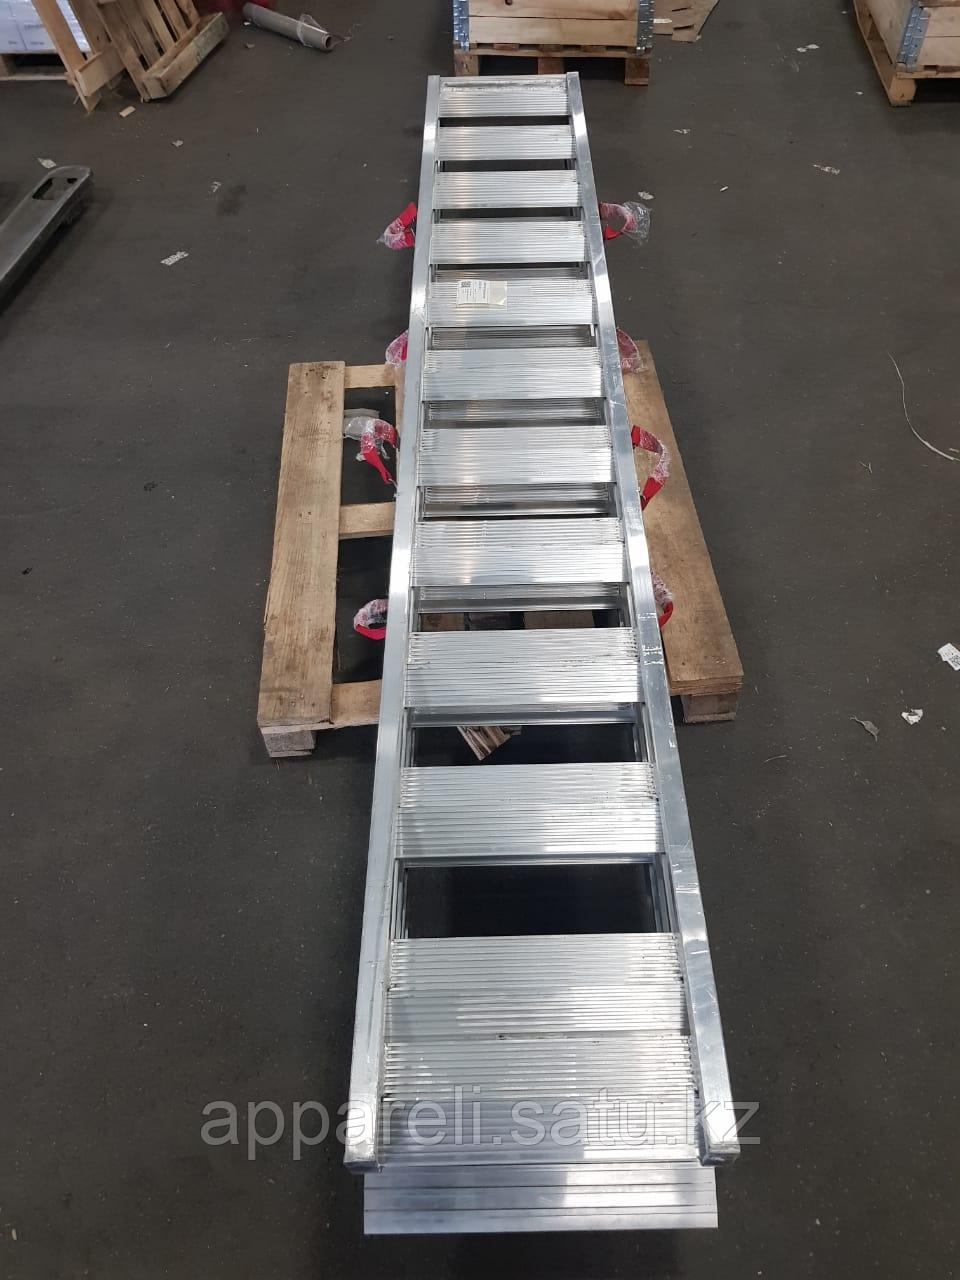 Производство рамп алюминиевых для спецтехники 7000 кг